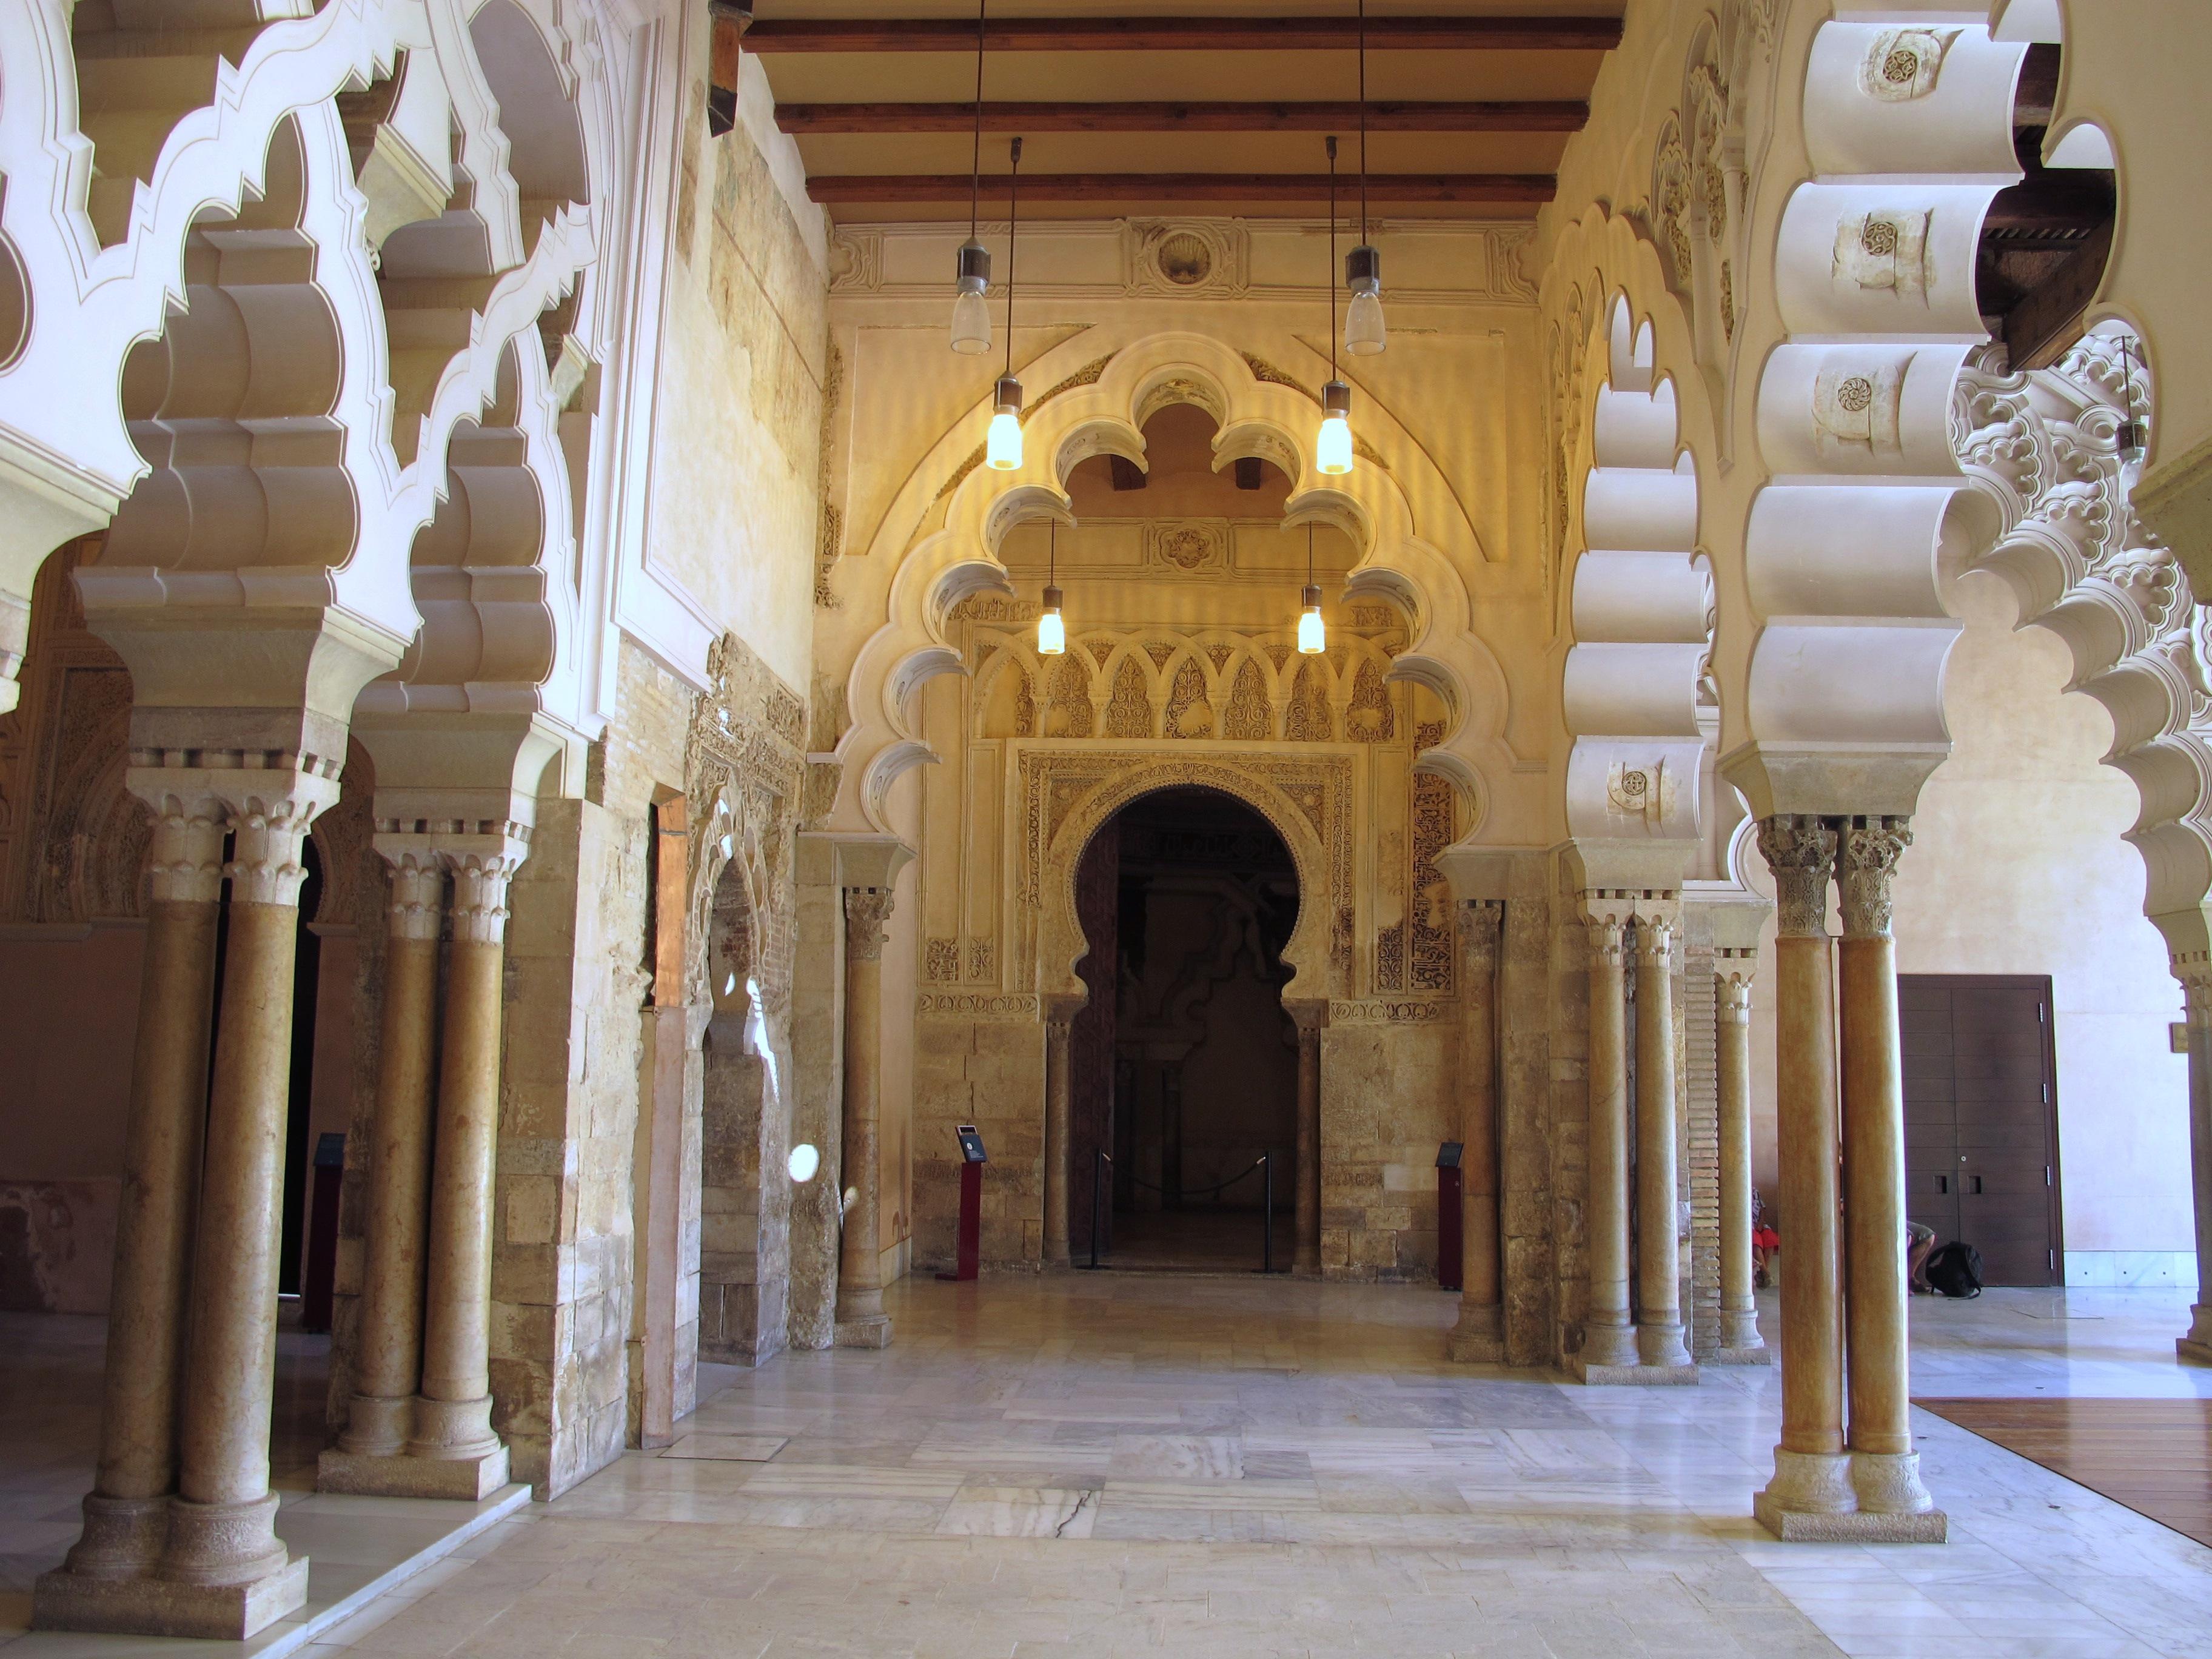 File:Zaragoza-Aljaferia-islamic-palace-2.JPG - Wikimedia Commons